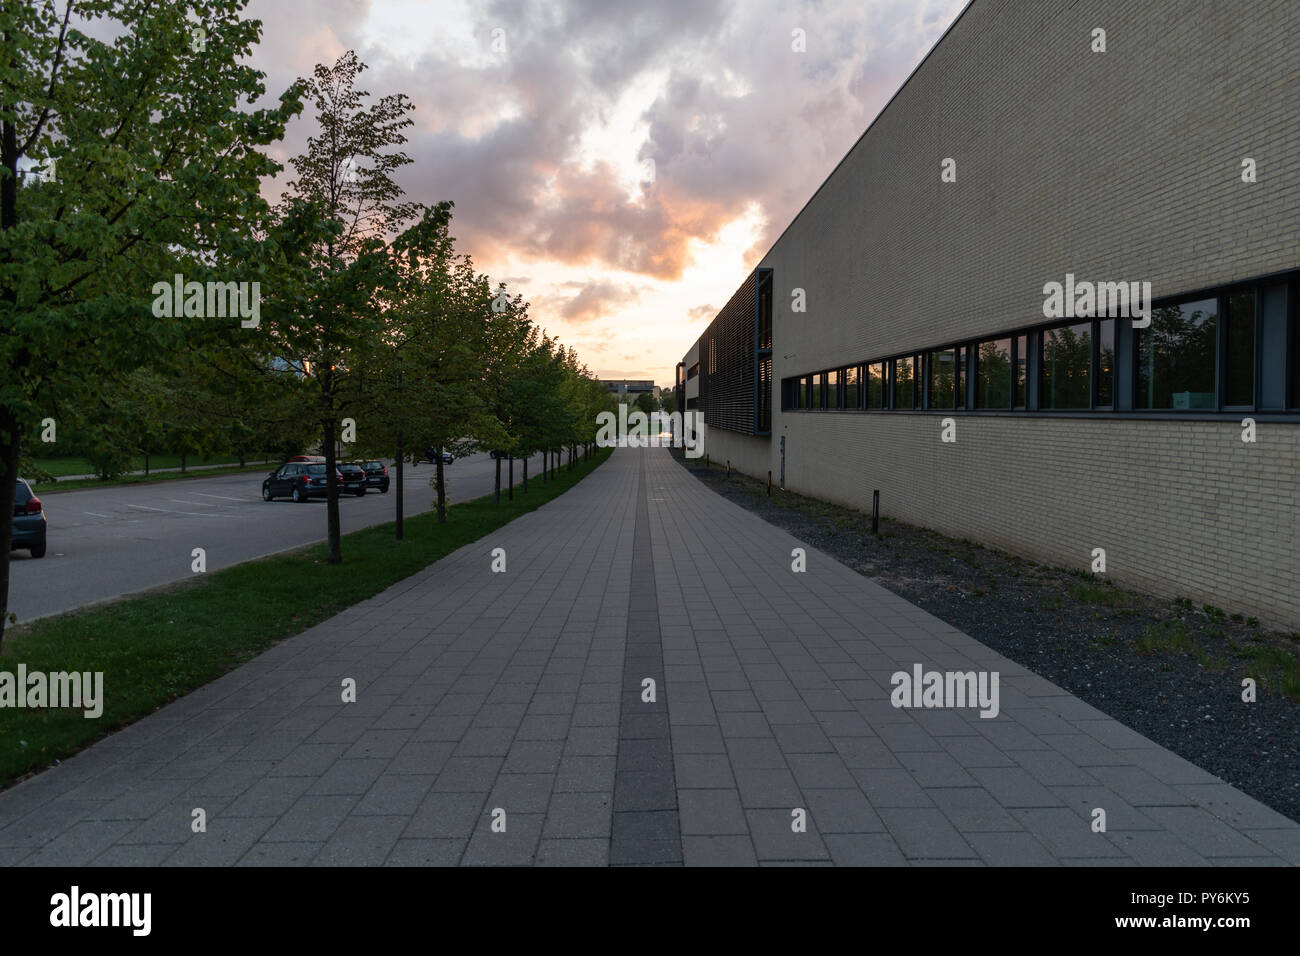 Roskilde, Denmark - 08.24.2018: University College Sjaelland in Denmark - Stock Image